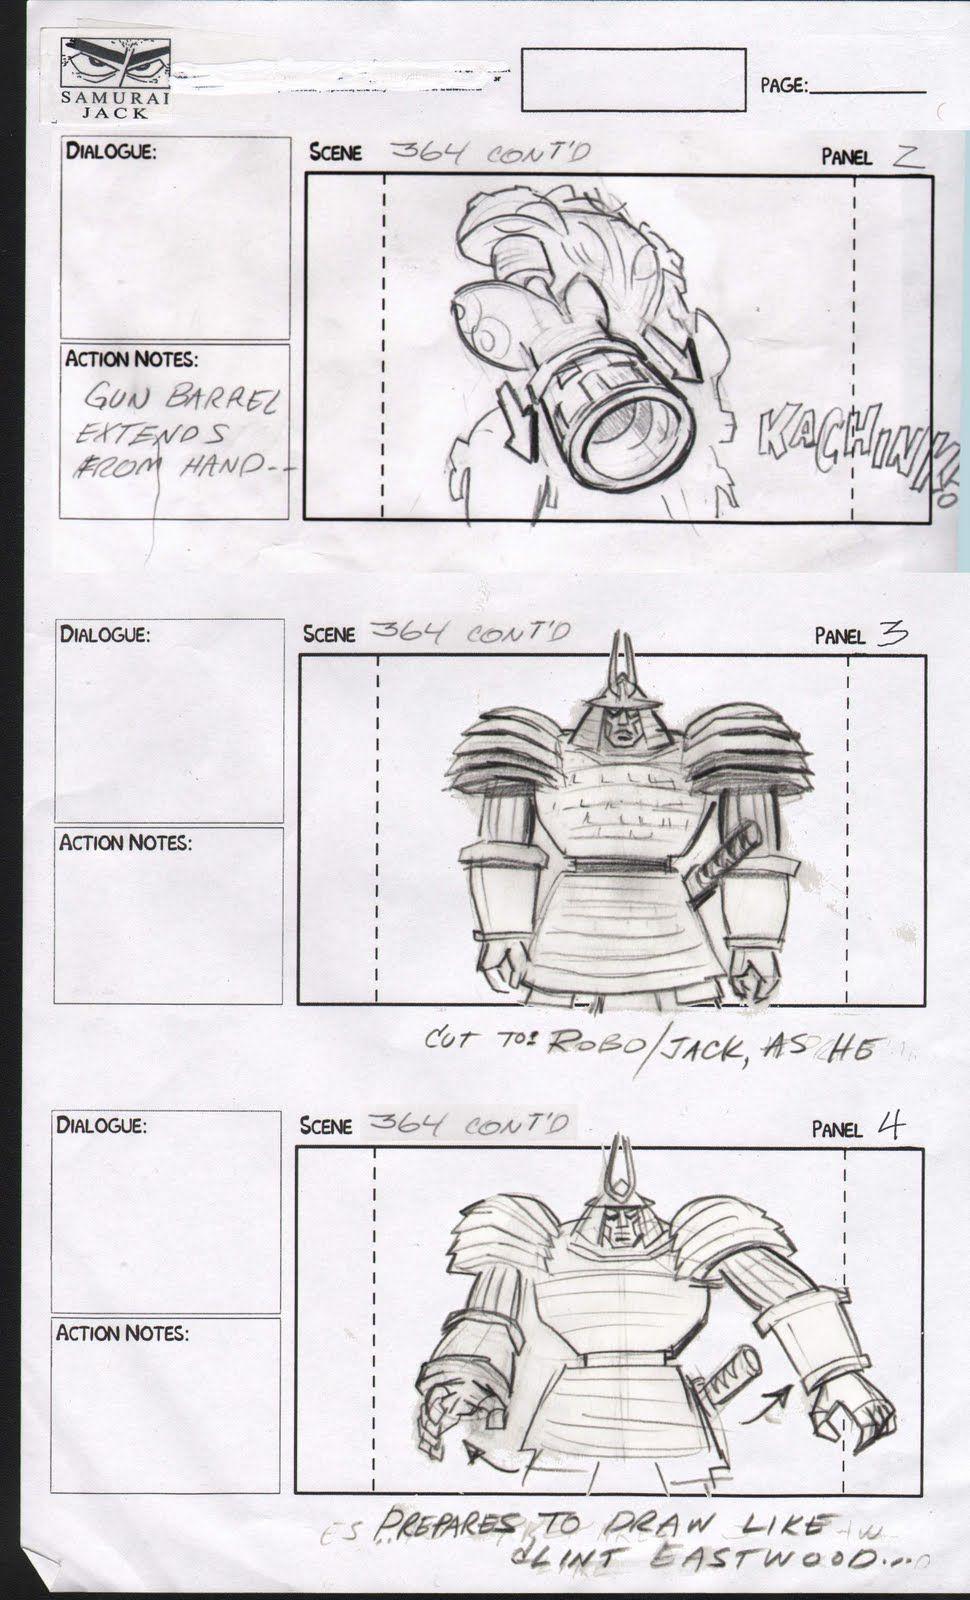 Jim Smith Cartoons Storyboards  Samurai Jack